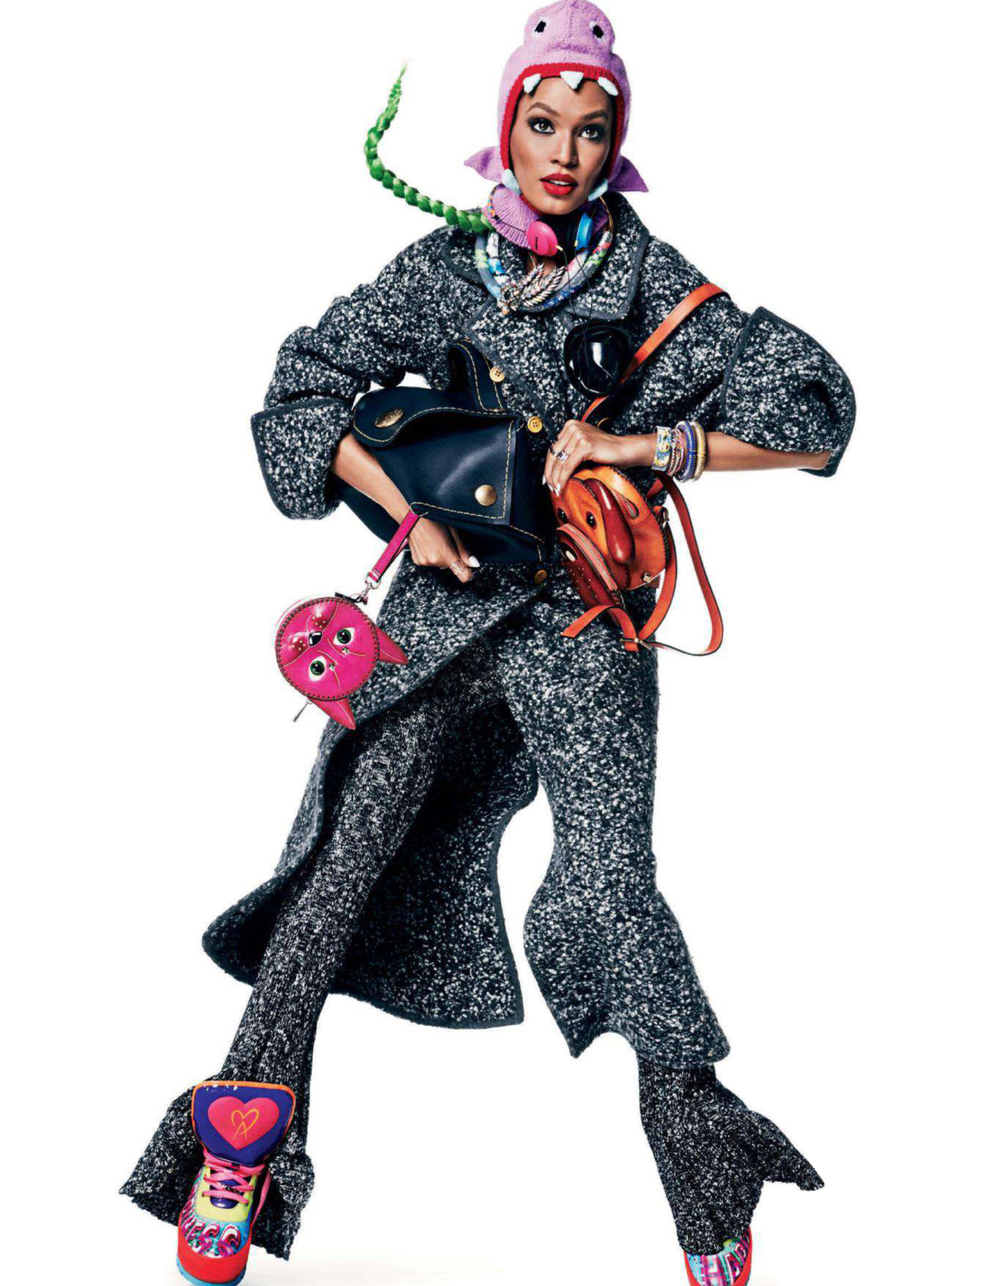 Giampaolo-Sgura-Joan-Smalls-Vogue-Japan-December-2014-7.jpg